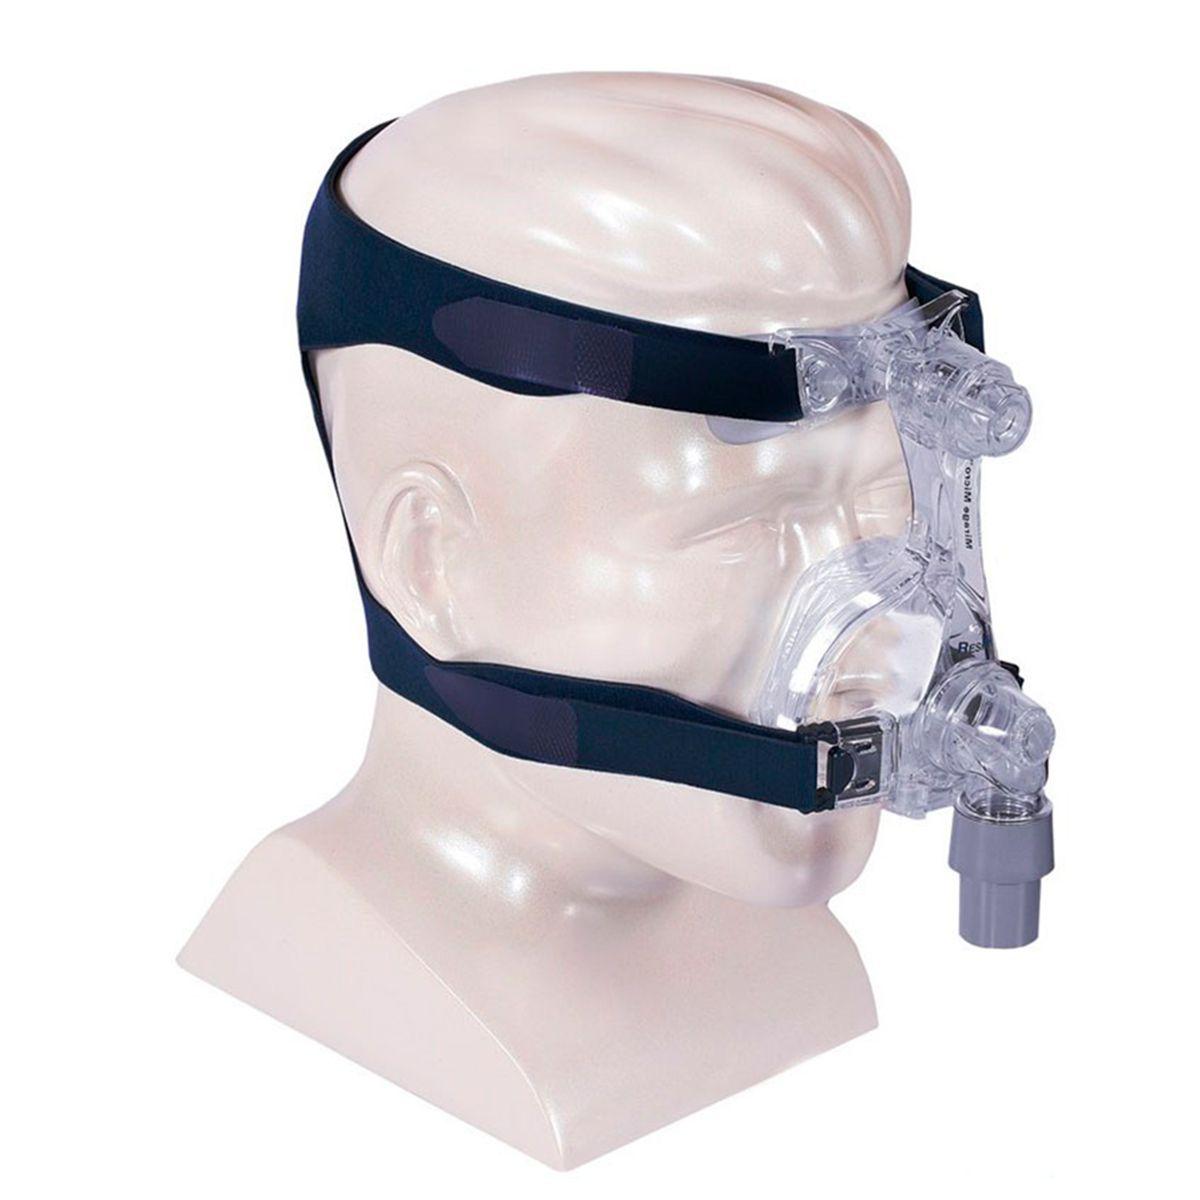 Kit CPAP Automático System One Serie 60 + Umidificador + Máscara Mirage Micro Resmed